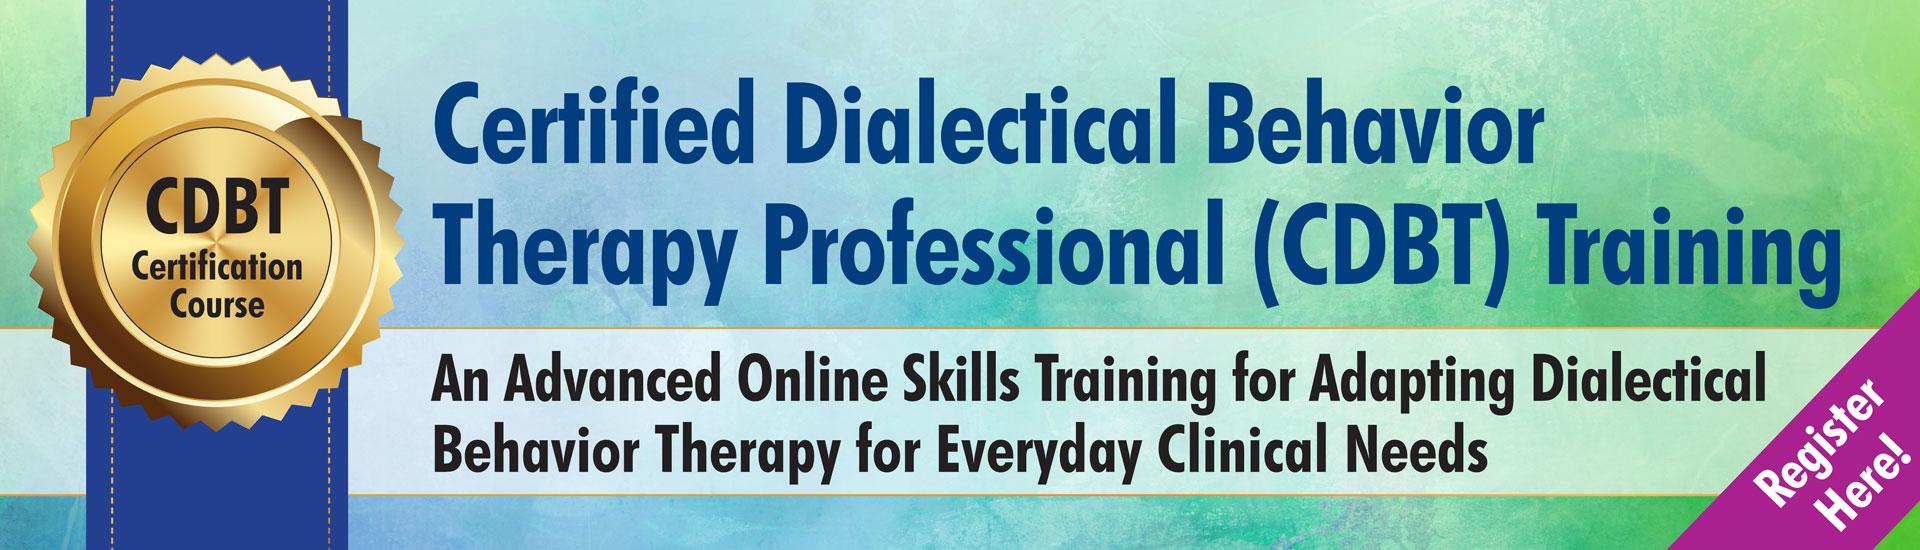 CDBT Training Online Course